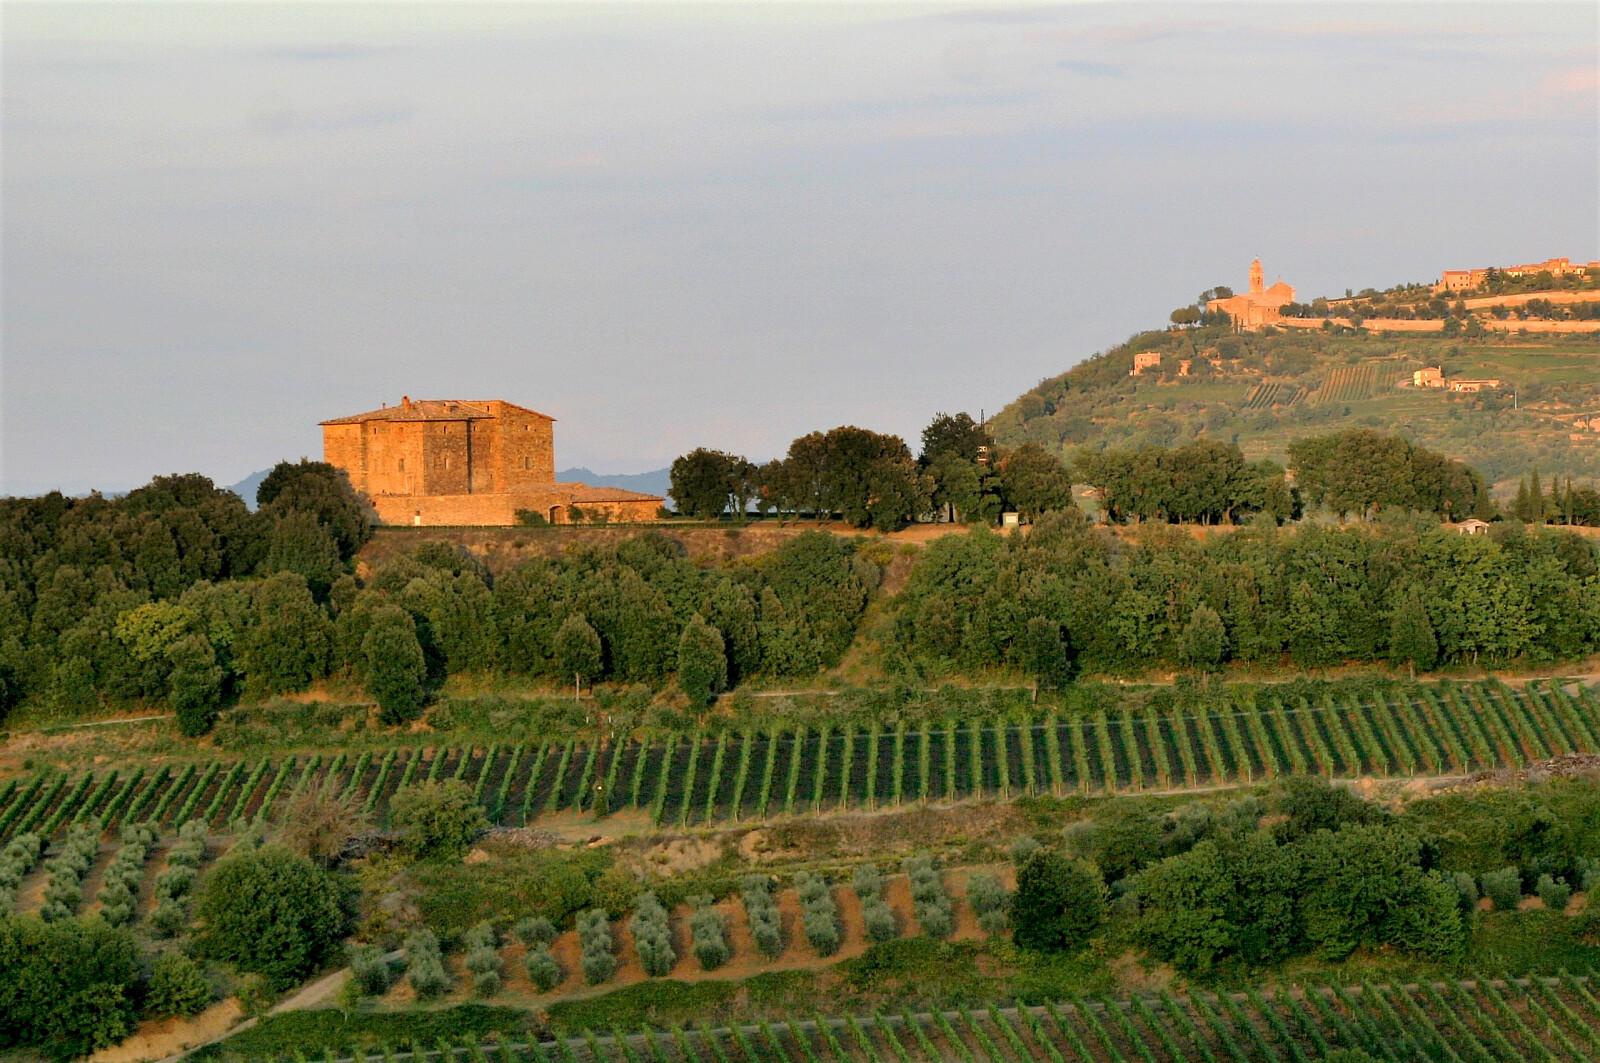 Castle Village Castello Romitorio.jpg [1.04 MB]